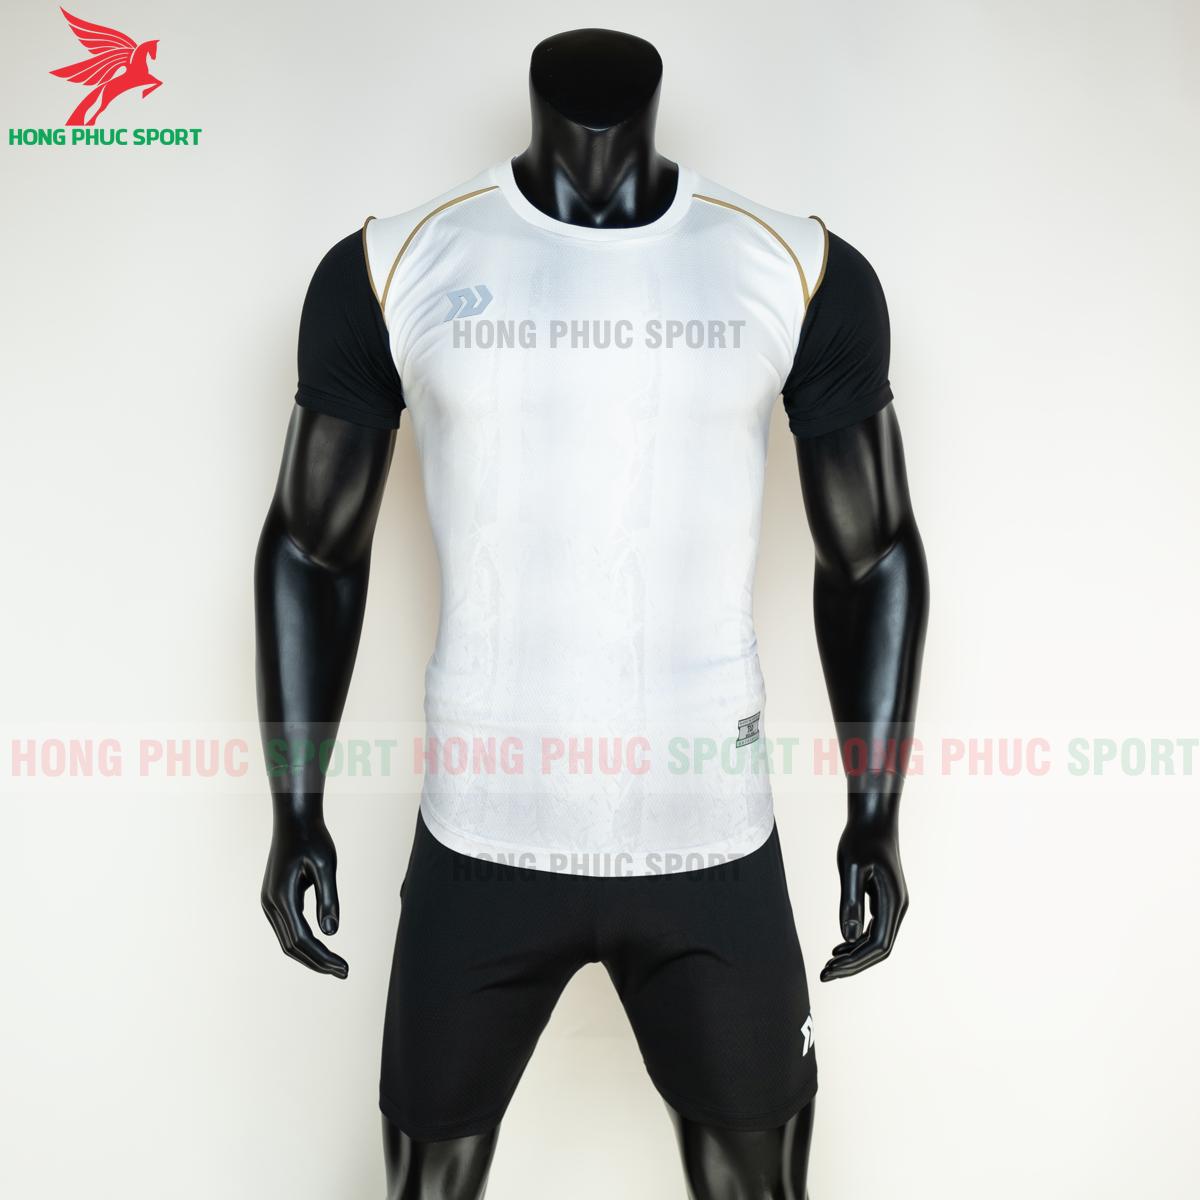 https://cdn.hongphucsport.com/unsafe/s4.shopbay.vn/files/285/ao-bong-da-khong-logo-bulbal-hades-mau-trang-2-604f30d7daef5.png